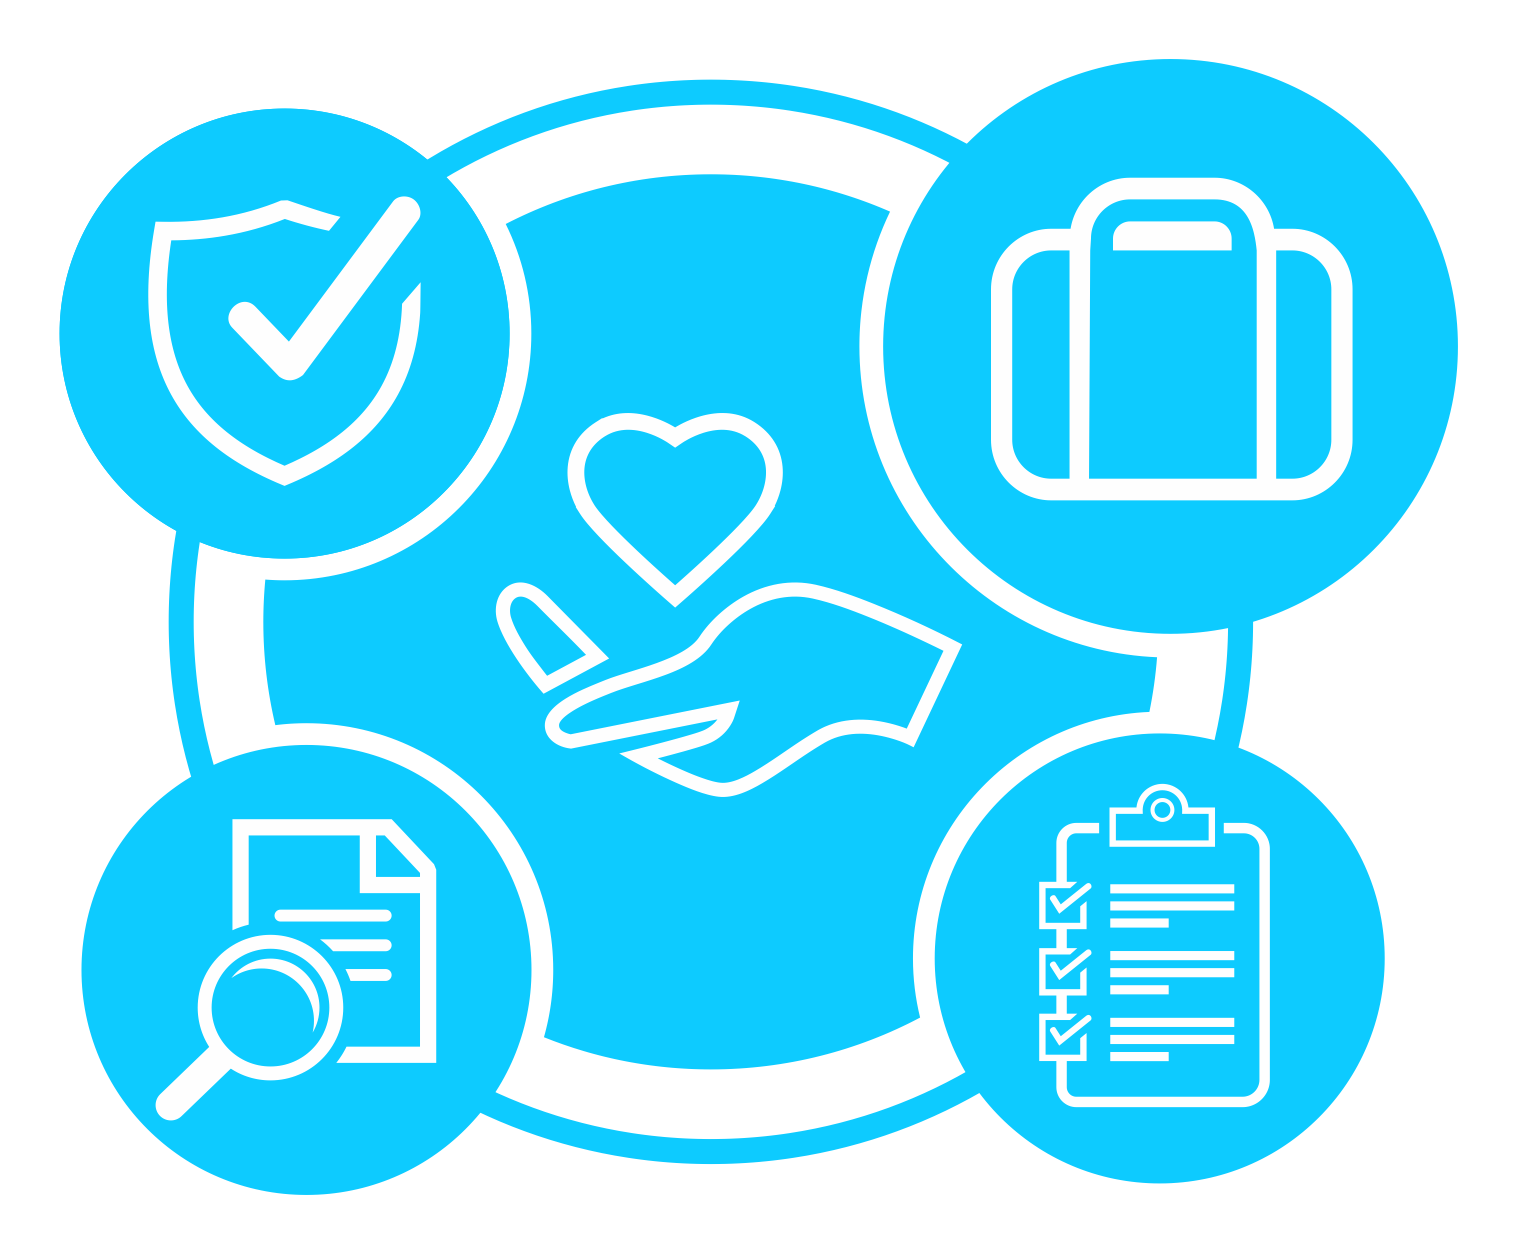 Symbol design of our Care Services